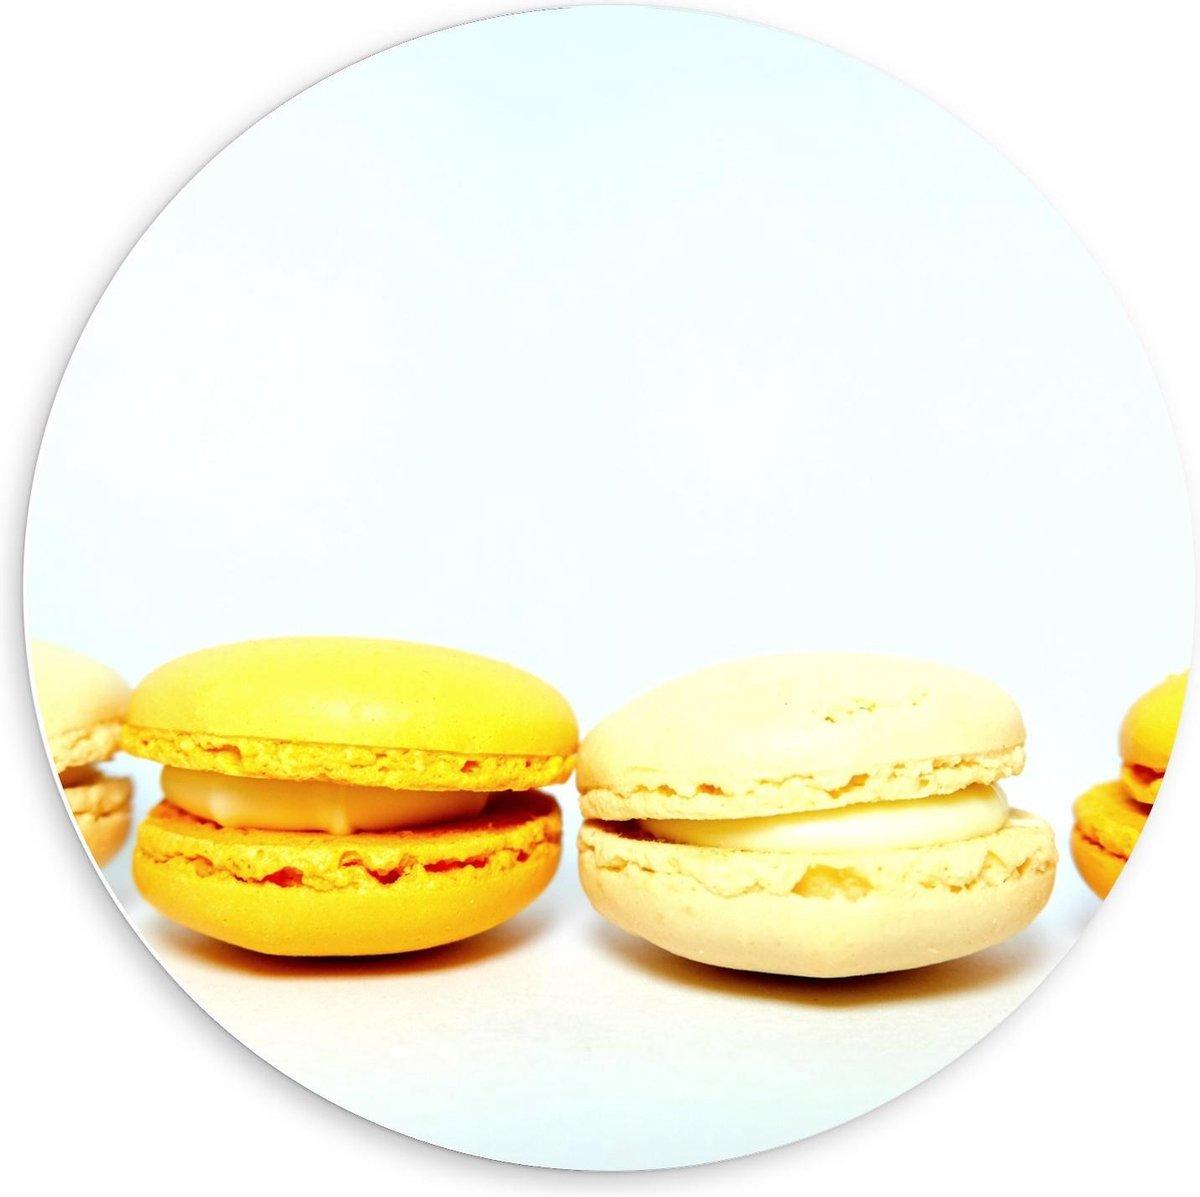 Forex Wandcirkel - Rij Gele Macarons - 60x60cm Foto op Wandcirkel (met ophangsysteem)